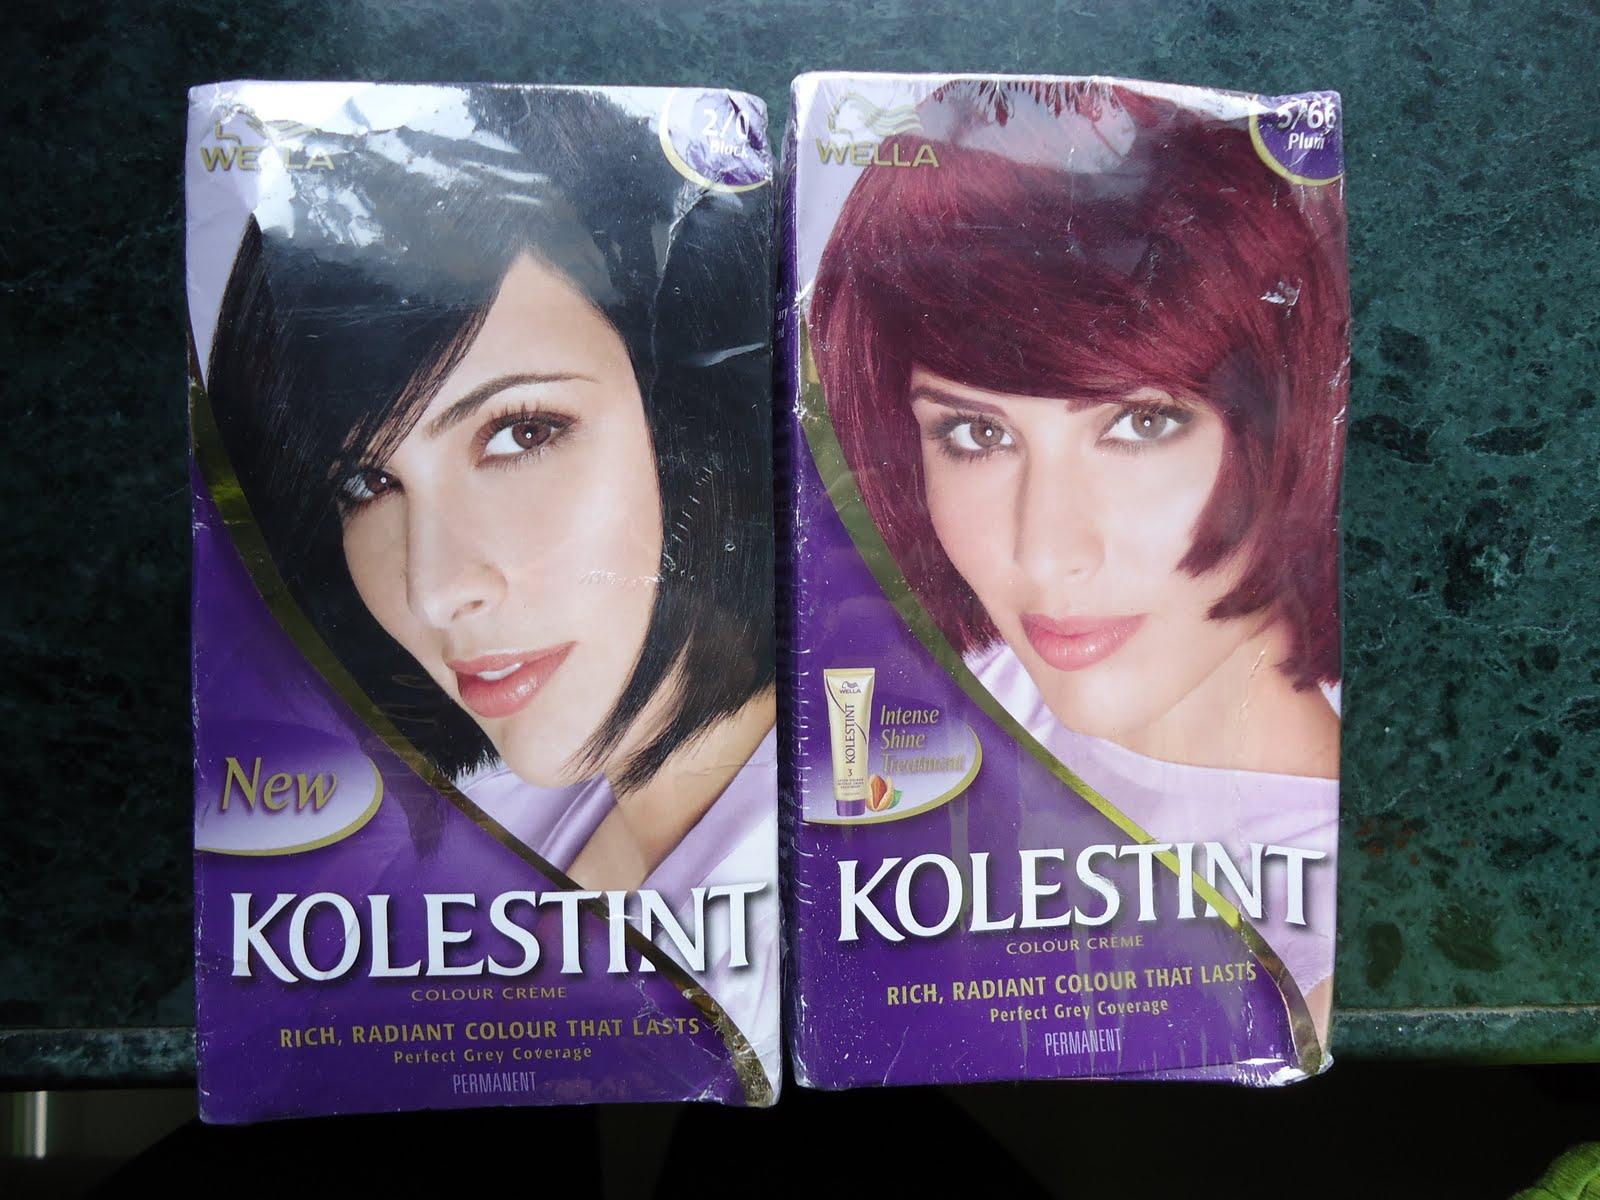 Wella Kolestint Hair Color Review New Love Makeup